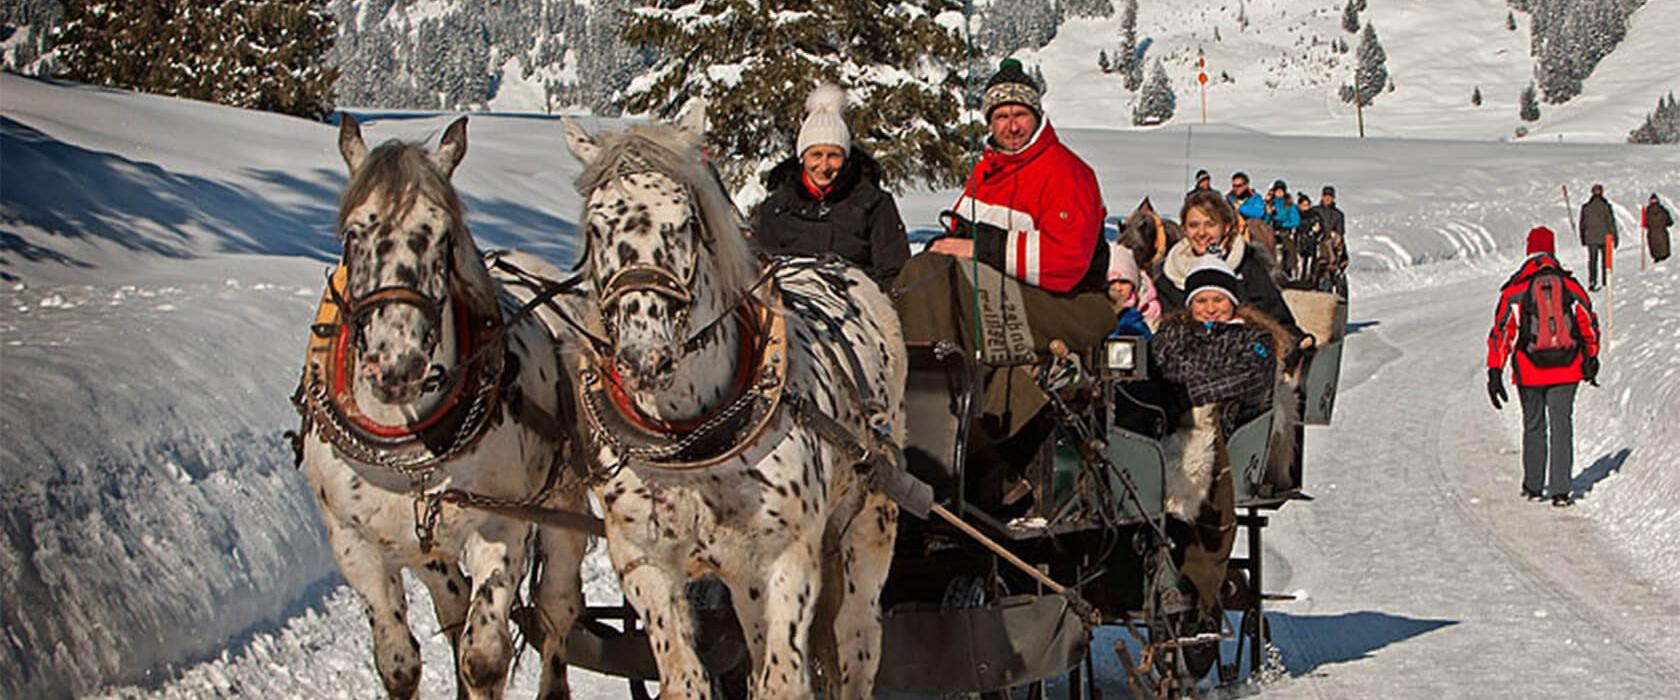 Pferdeschlittenfahrt im Tannheimer Tal